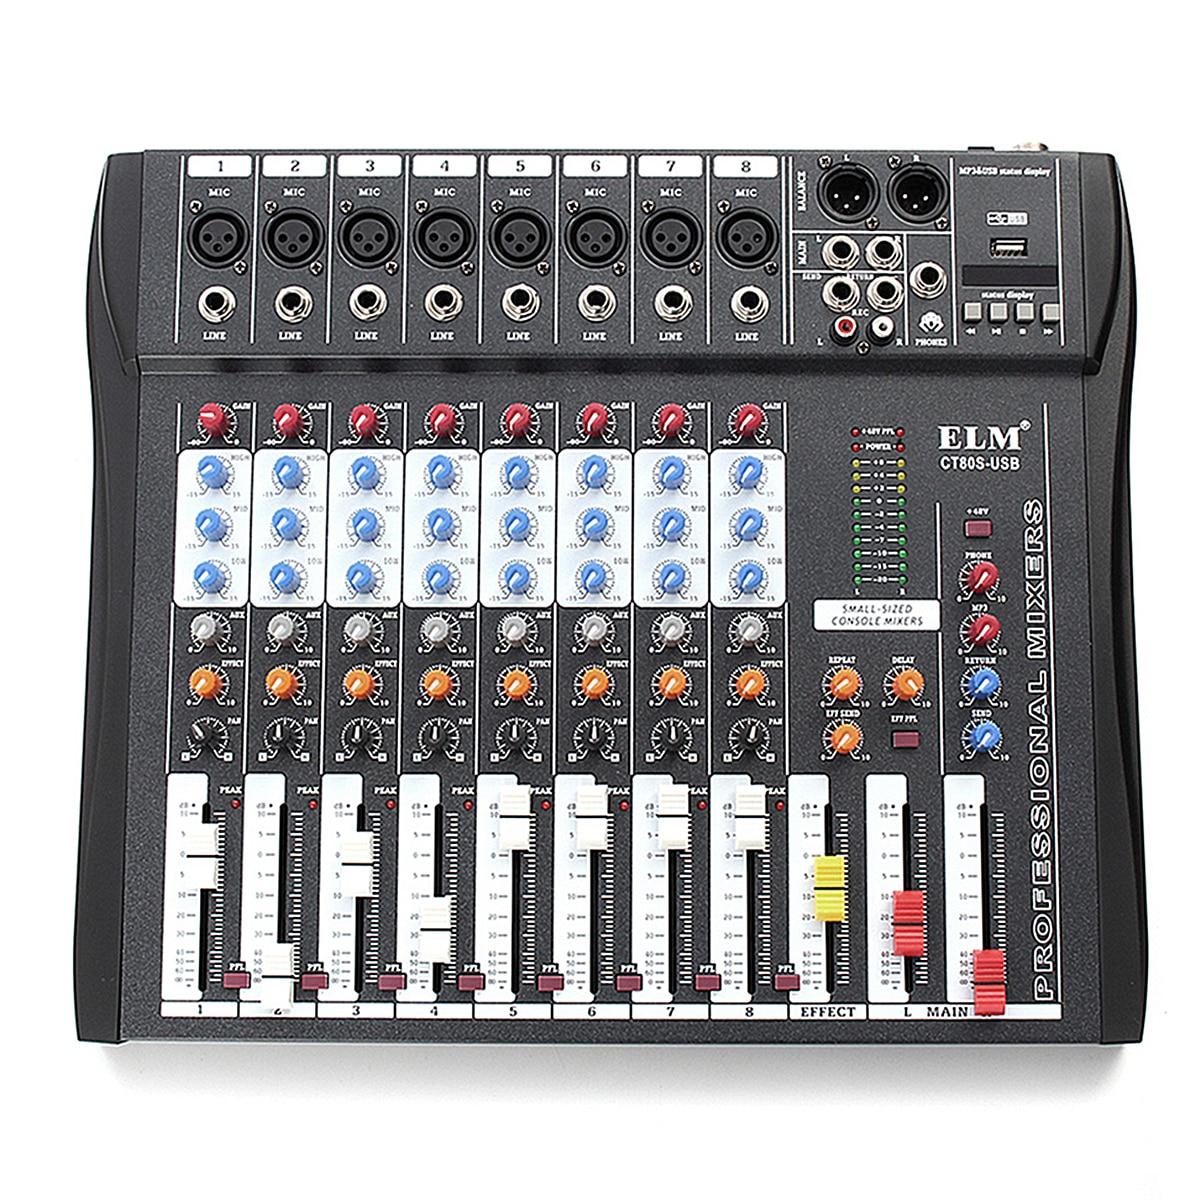 Professionnel 8 Canal DJ Mixage Console avec Record Bluetooth Alimentation Fantôme Avec 48 v Alimentation Fantôme USB Jack